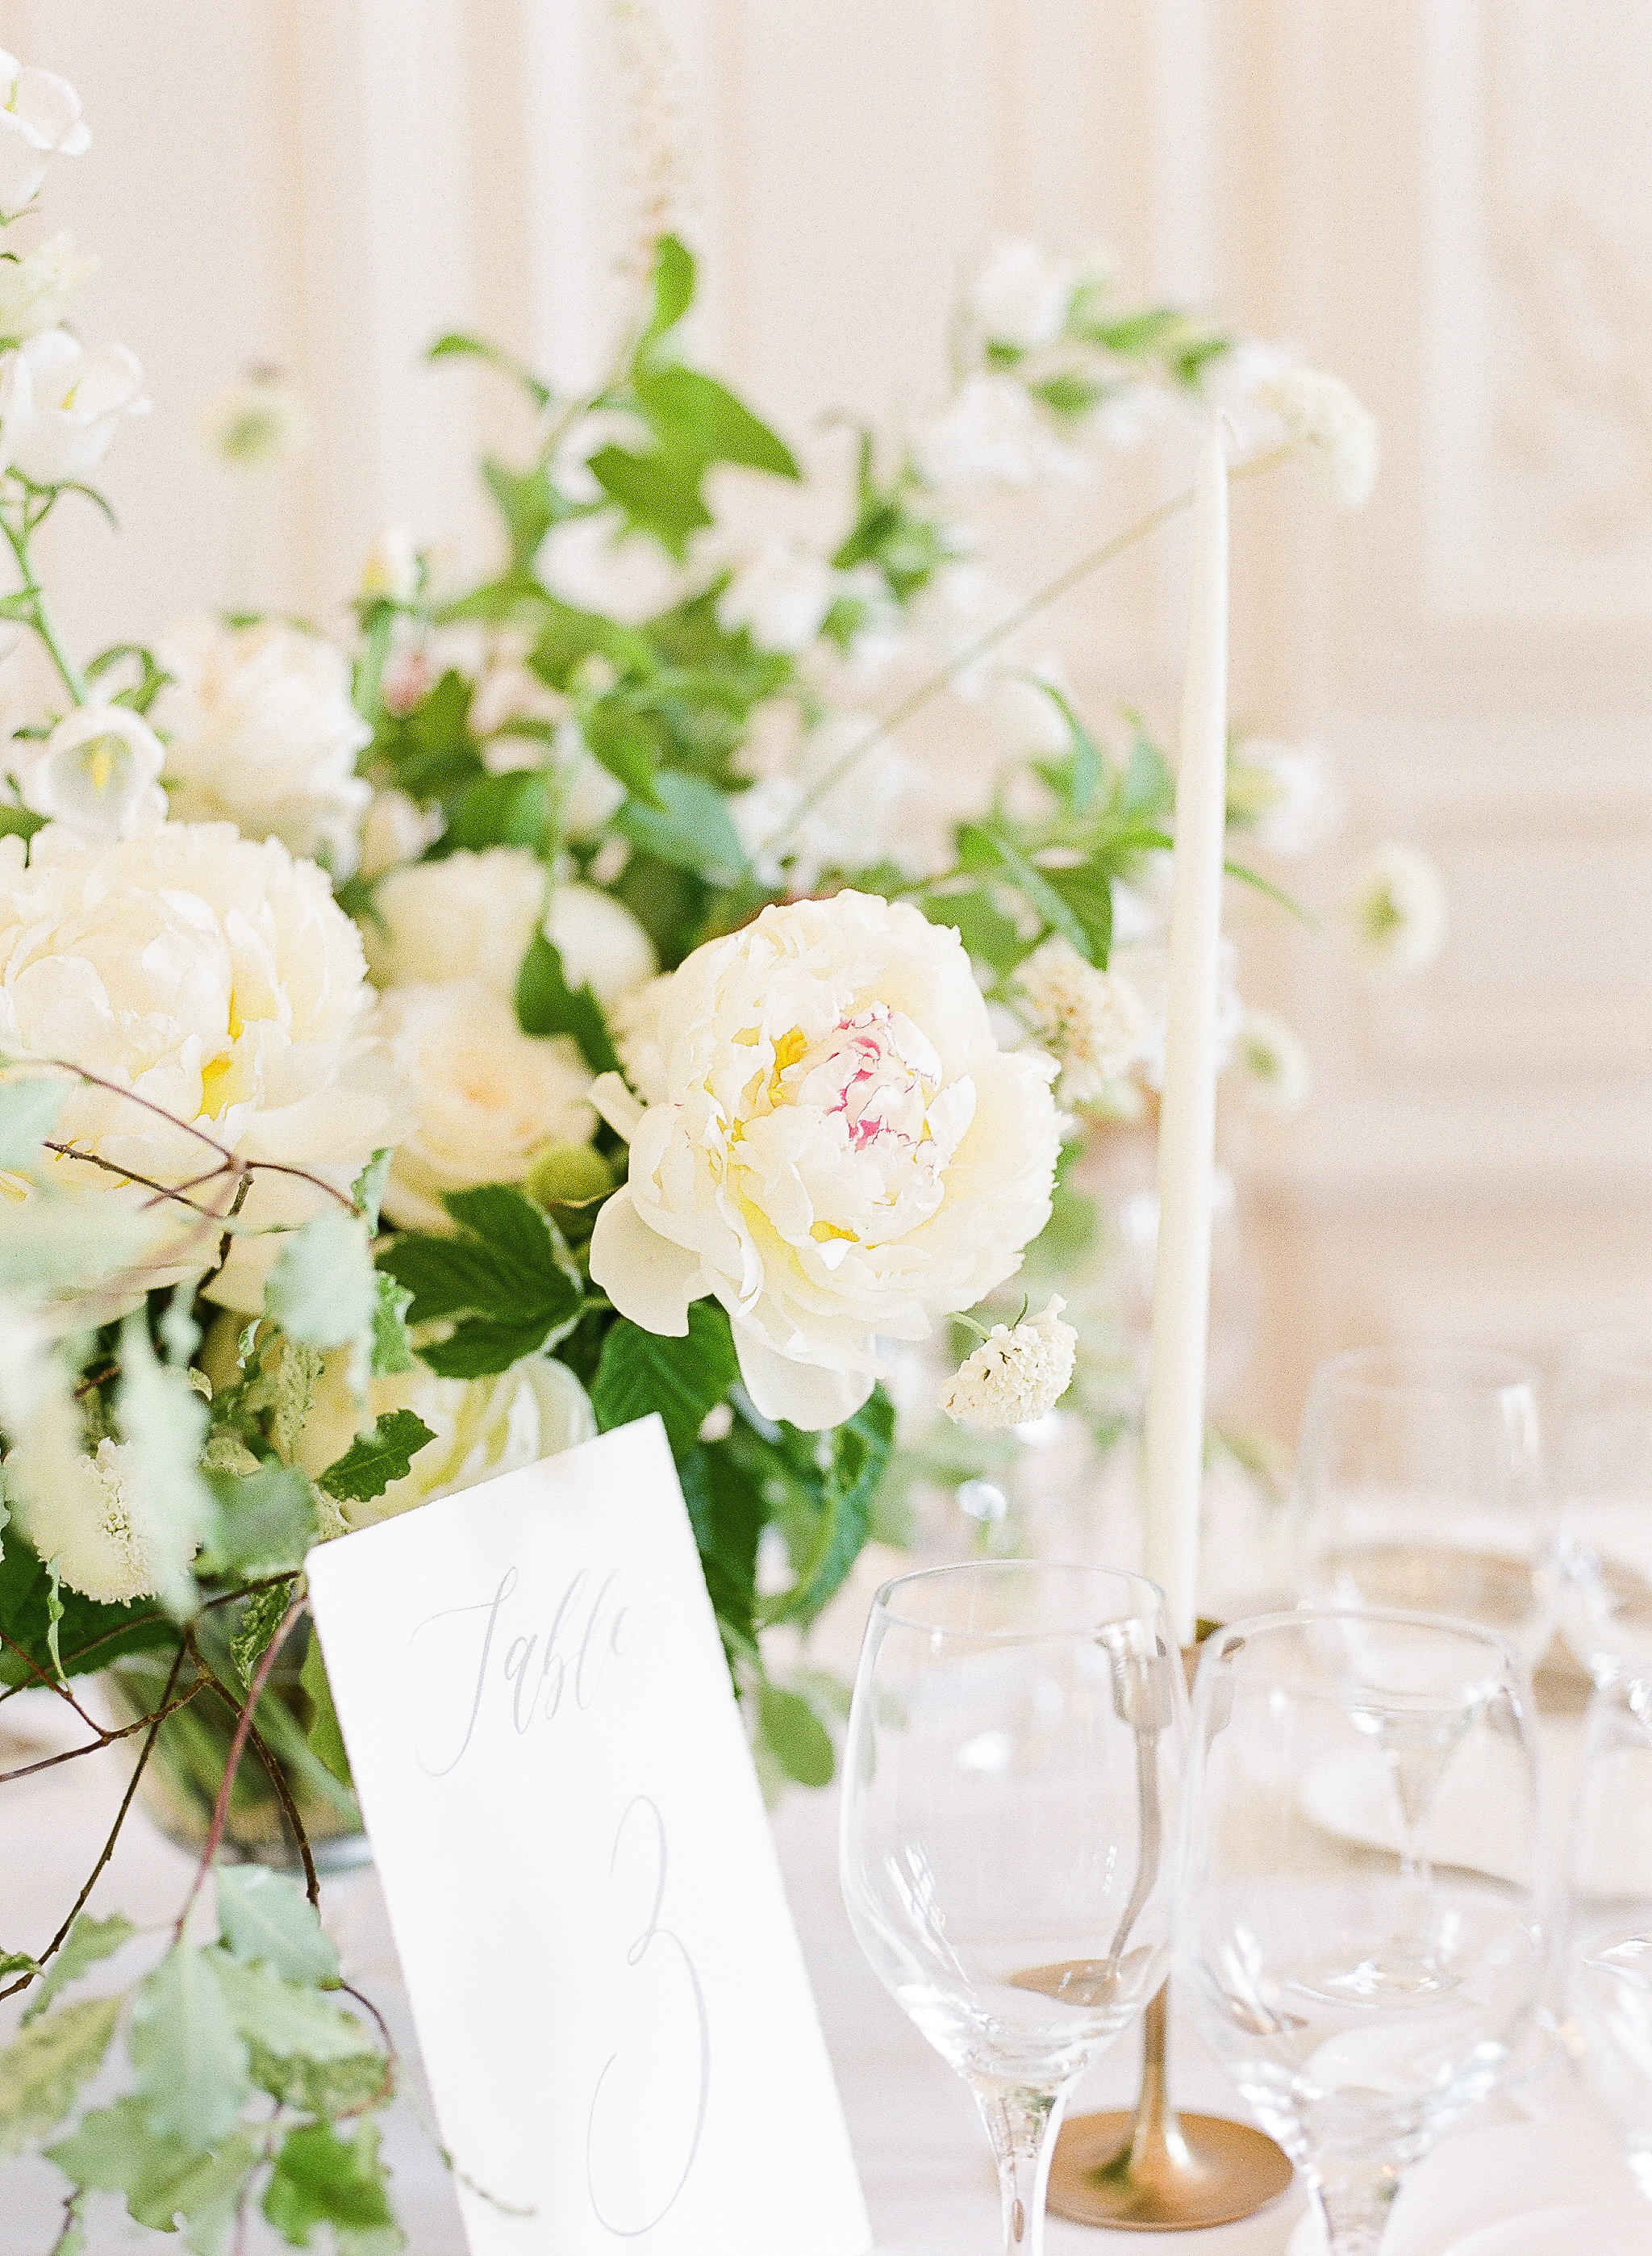 fine-art-wedding-florist-paris-france-wedding-white-and-green-flowers.jpg